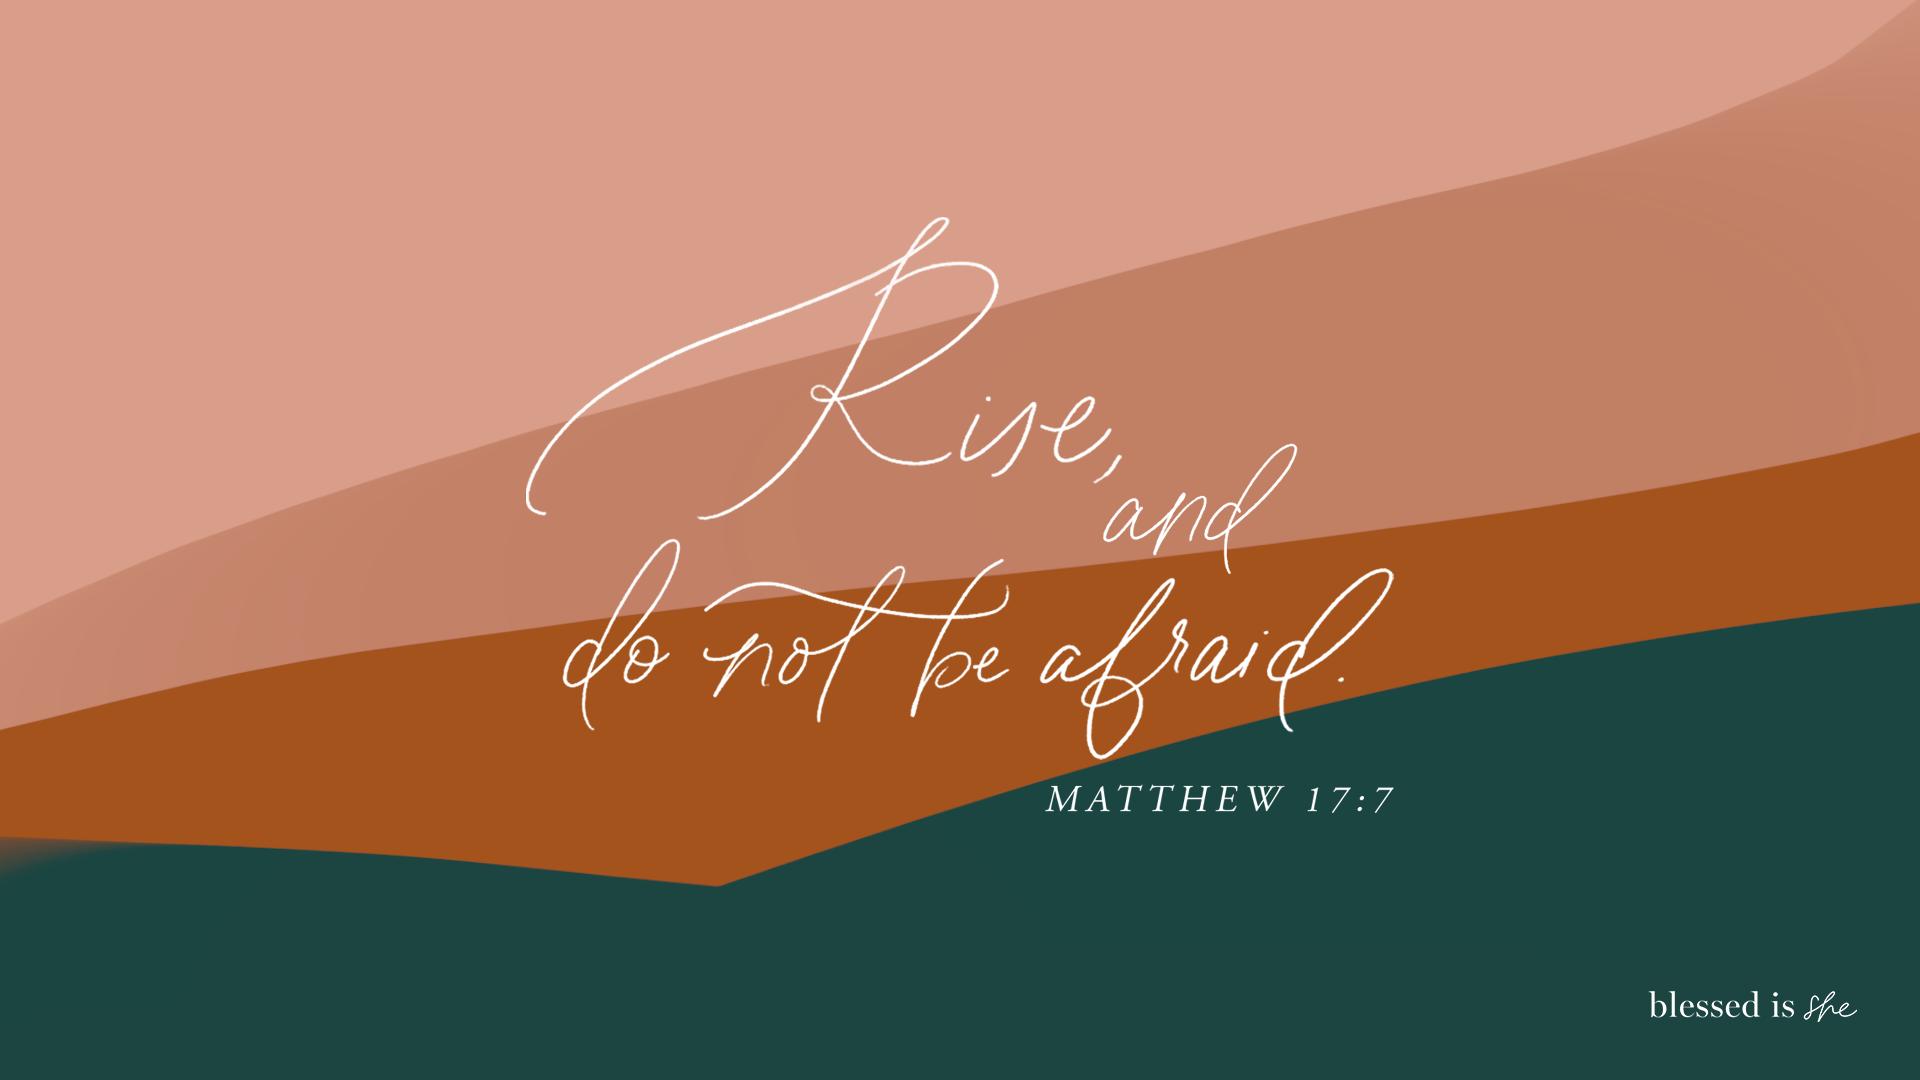 Aesthetic Bible Verses Wallpaper